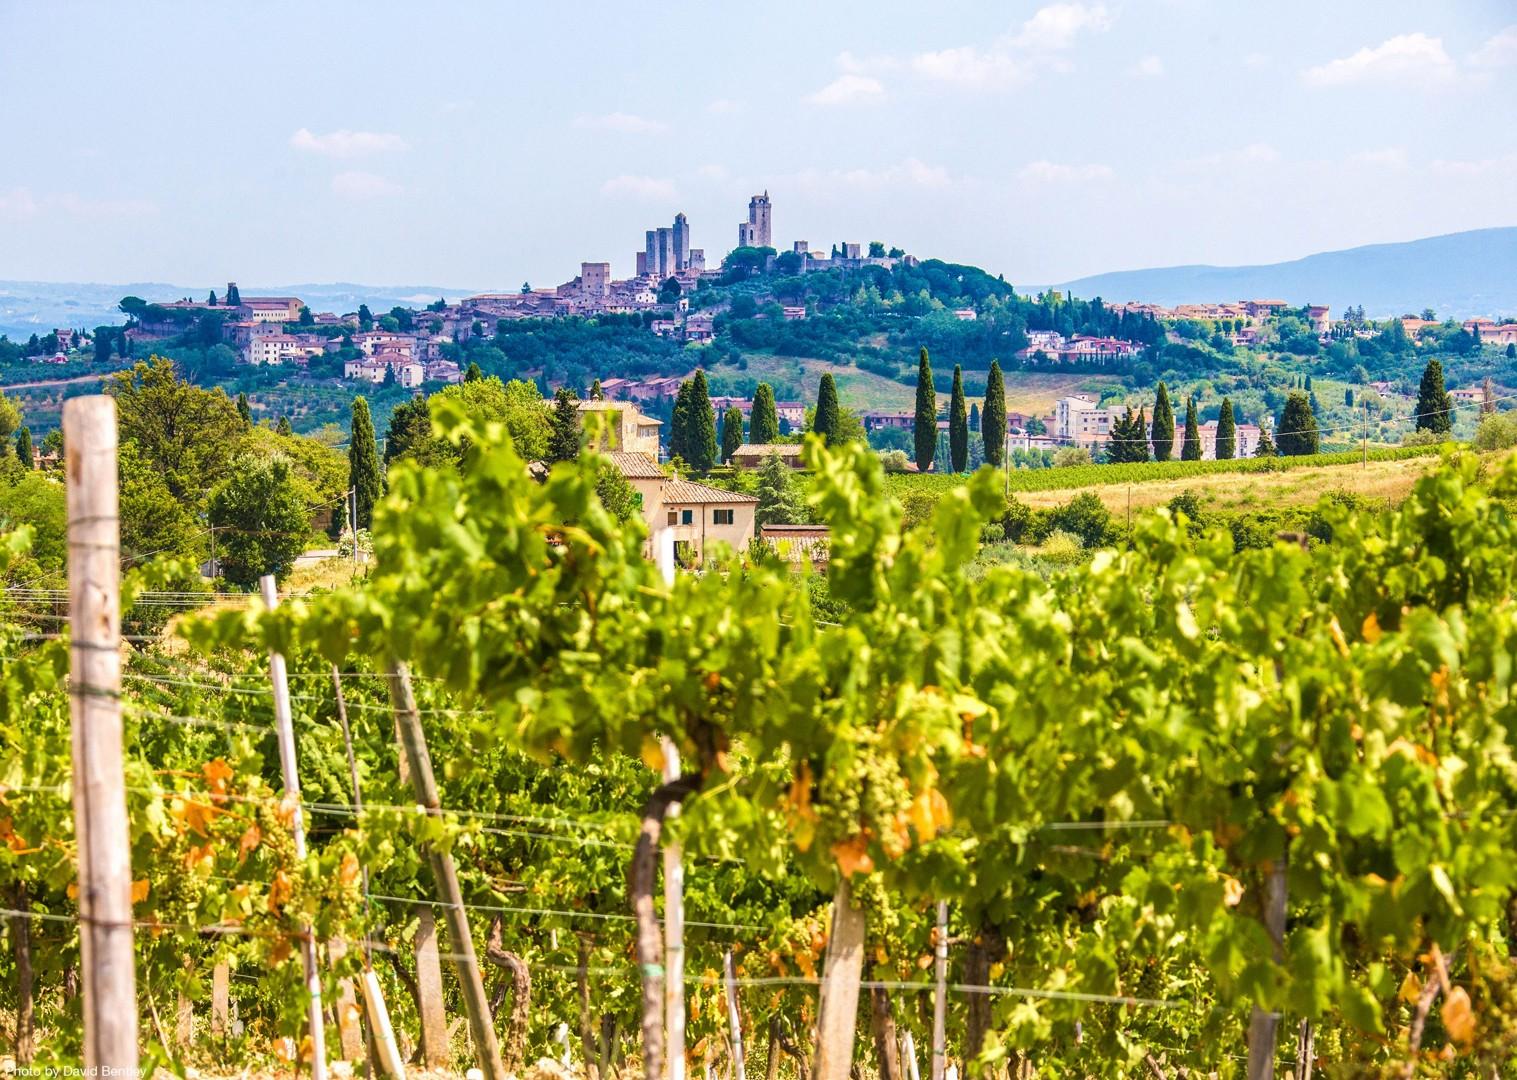 0018 Day 2 San Gimignano.jpg - Italy - Tuscany - Giro della Toscana - Self-Guided Road Cycling Holiday - Road Cycling